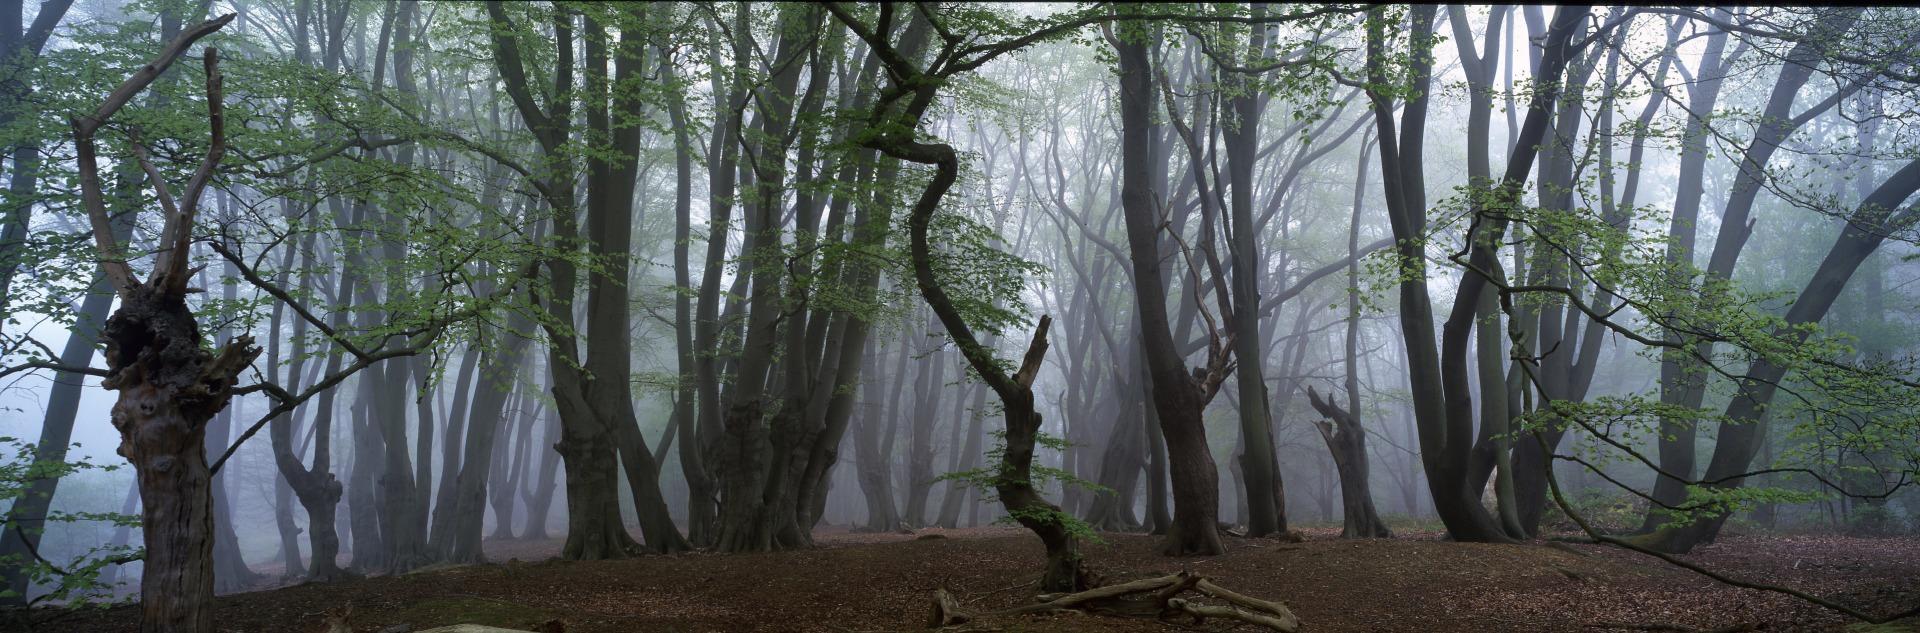 Beech Pollards in mist